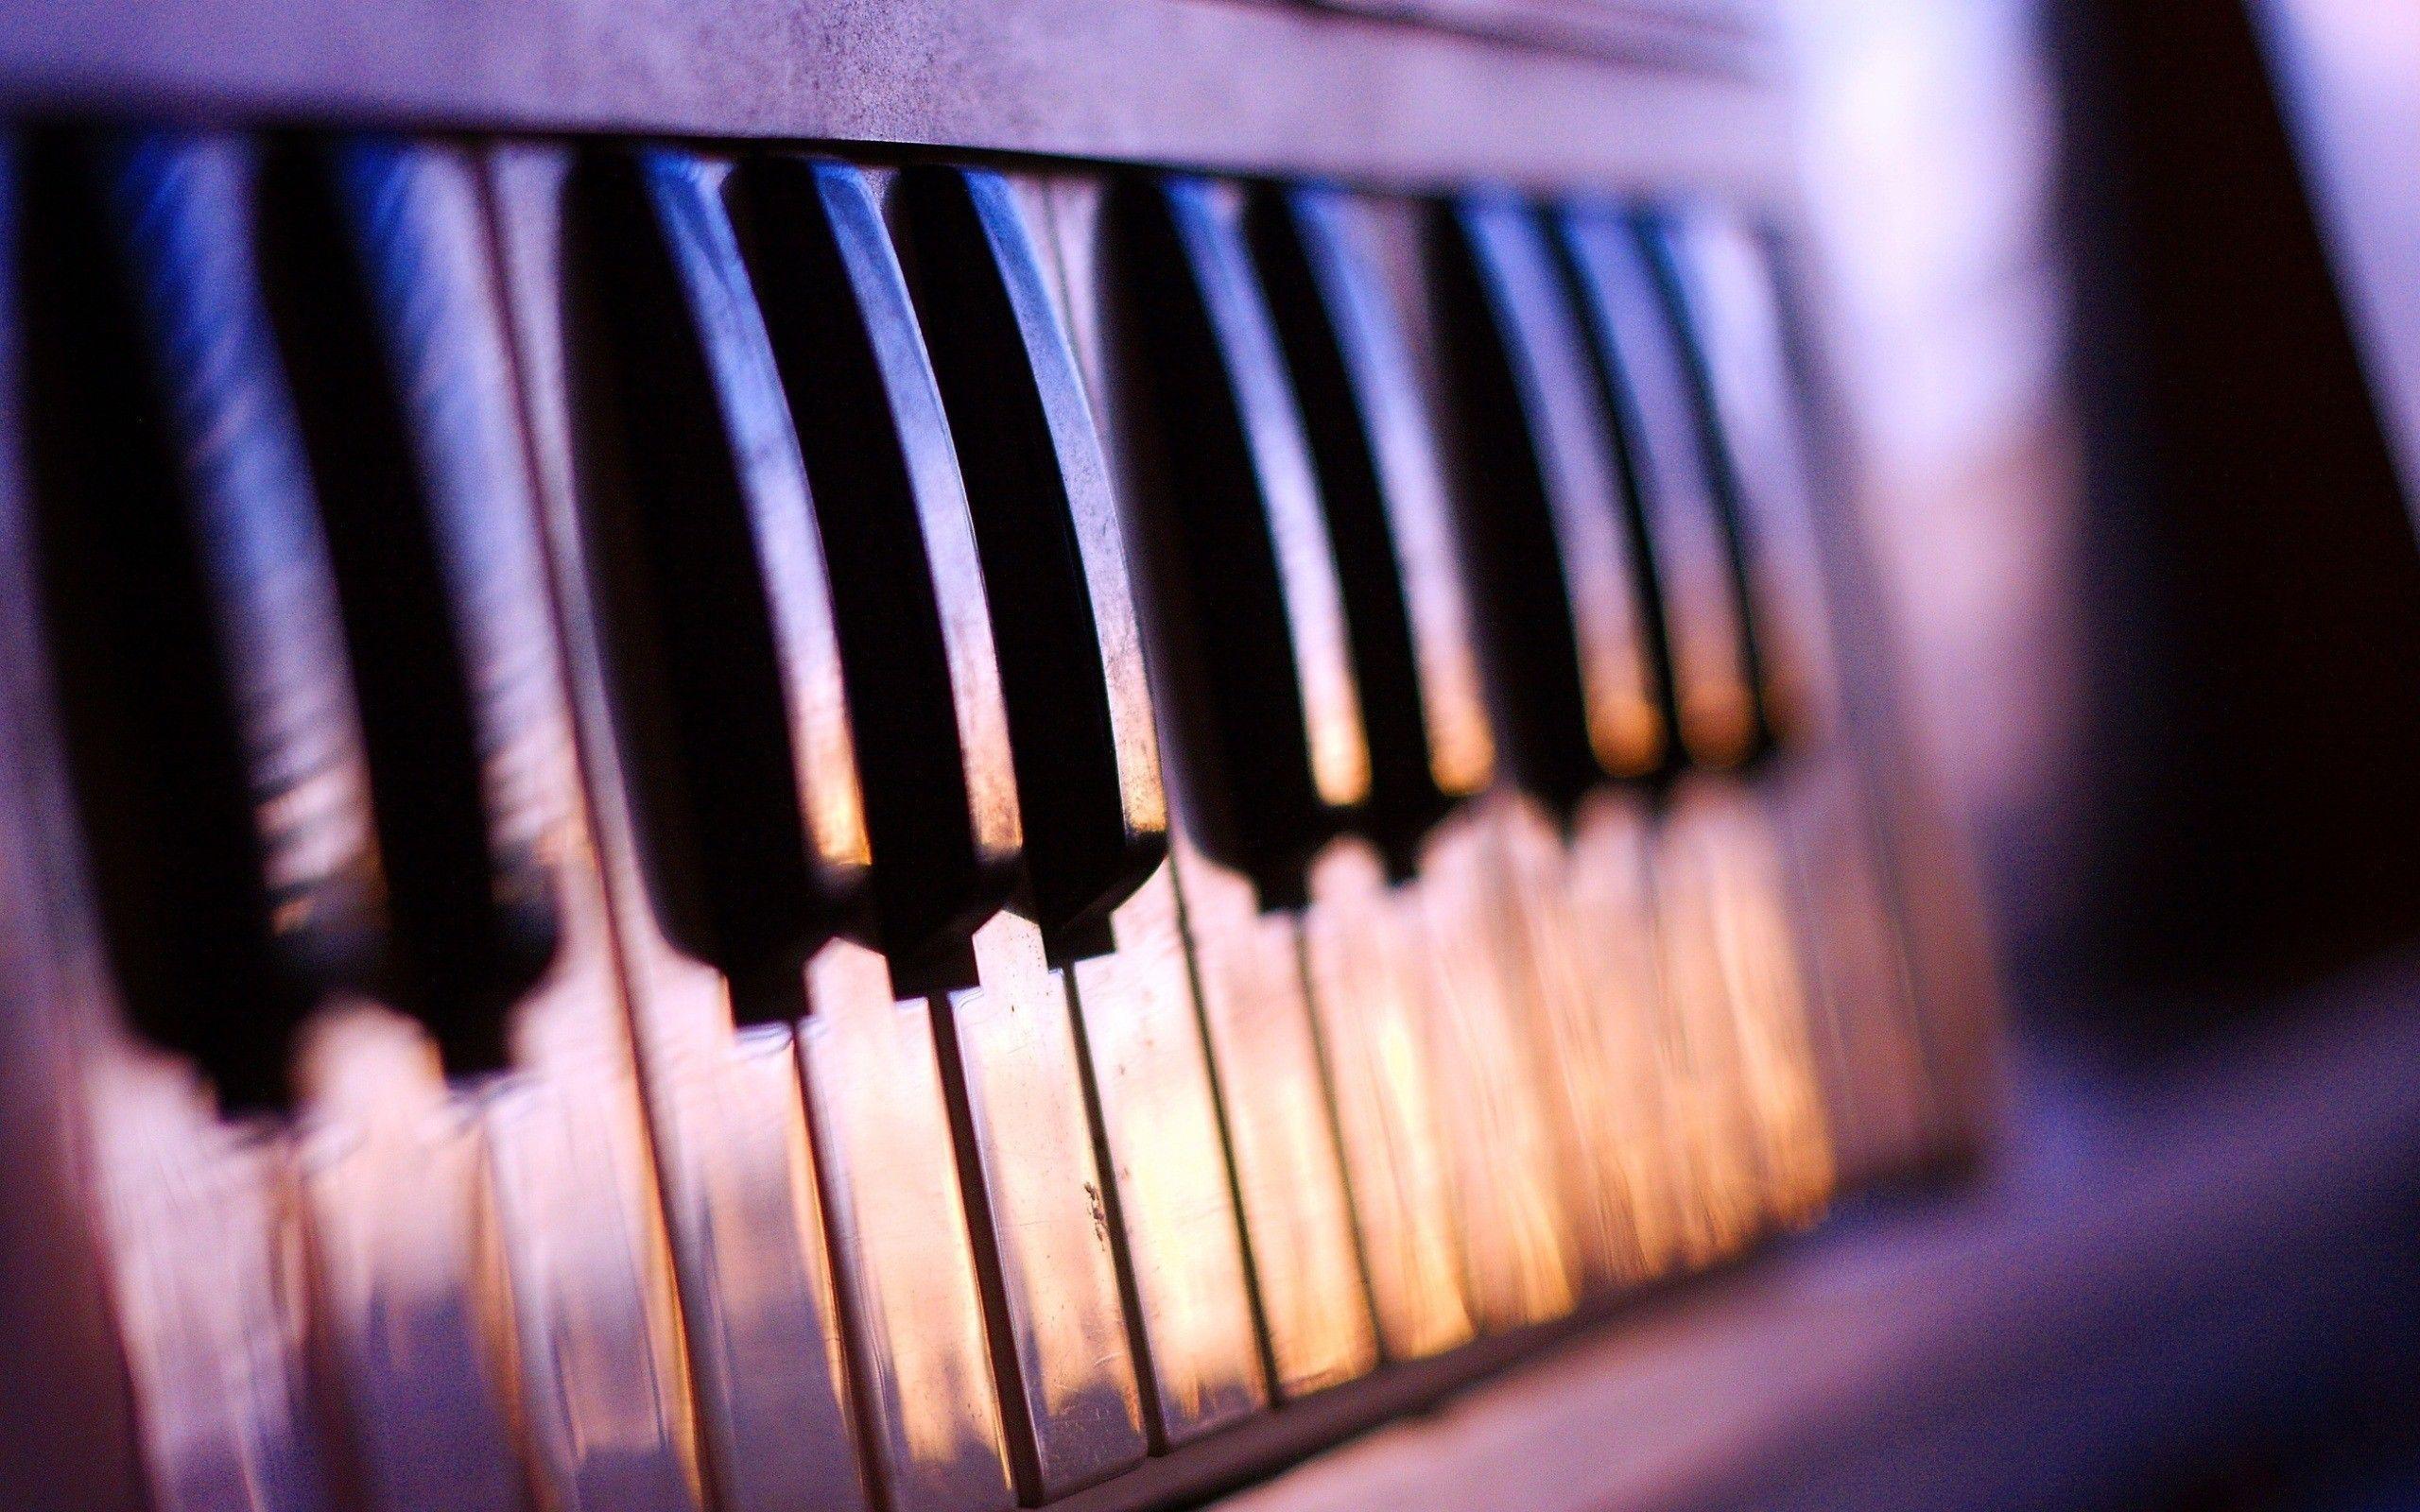 instruments keyboard wallpaper - photo #2